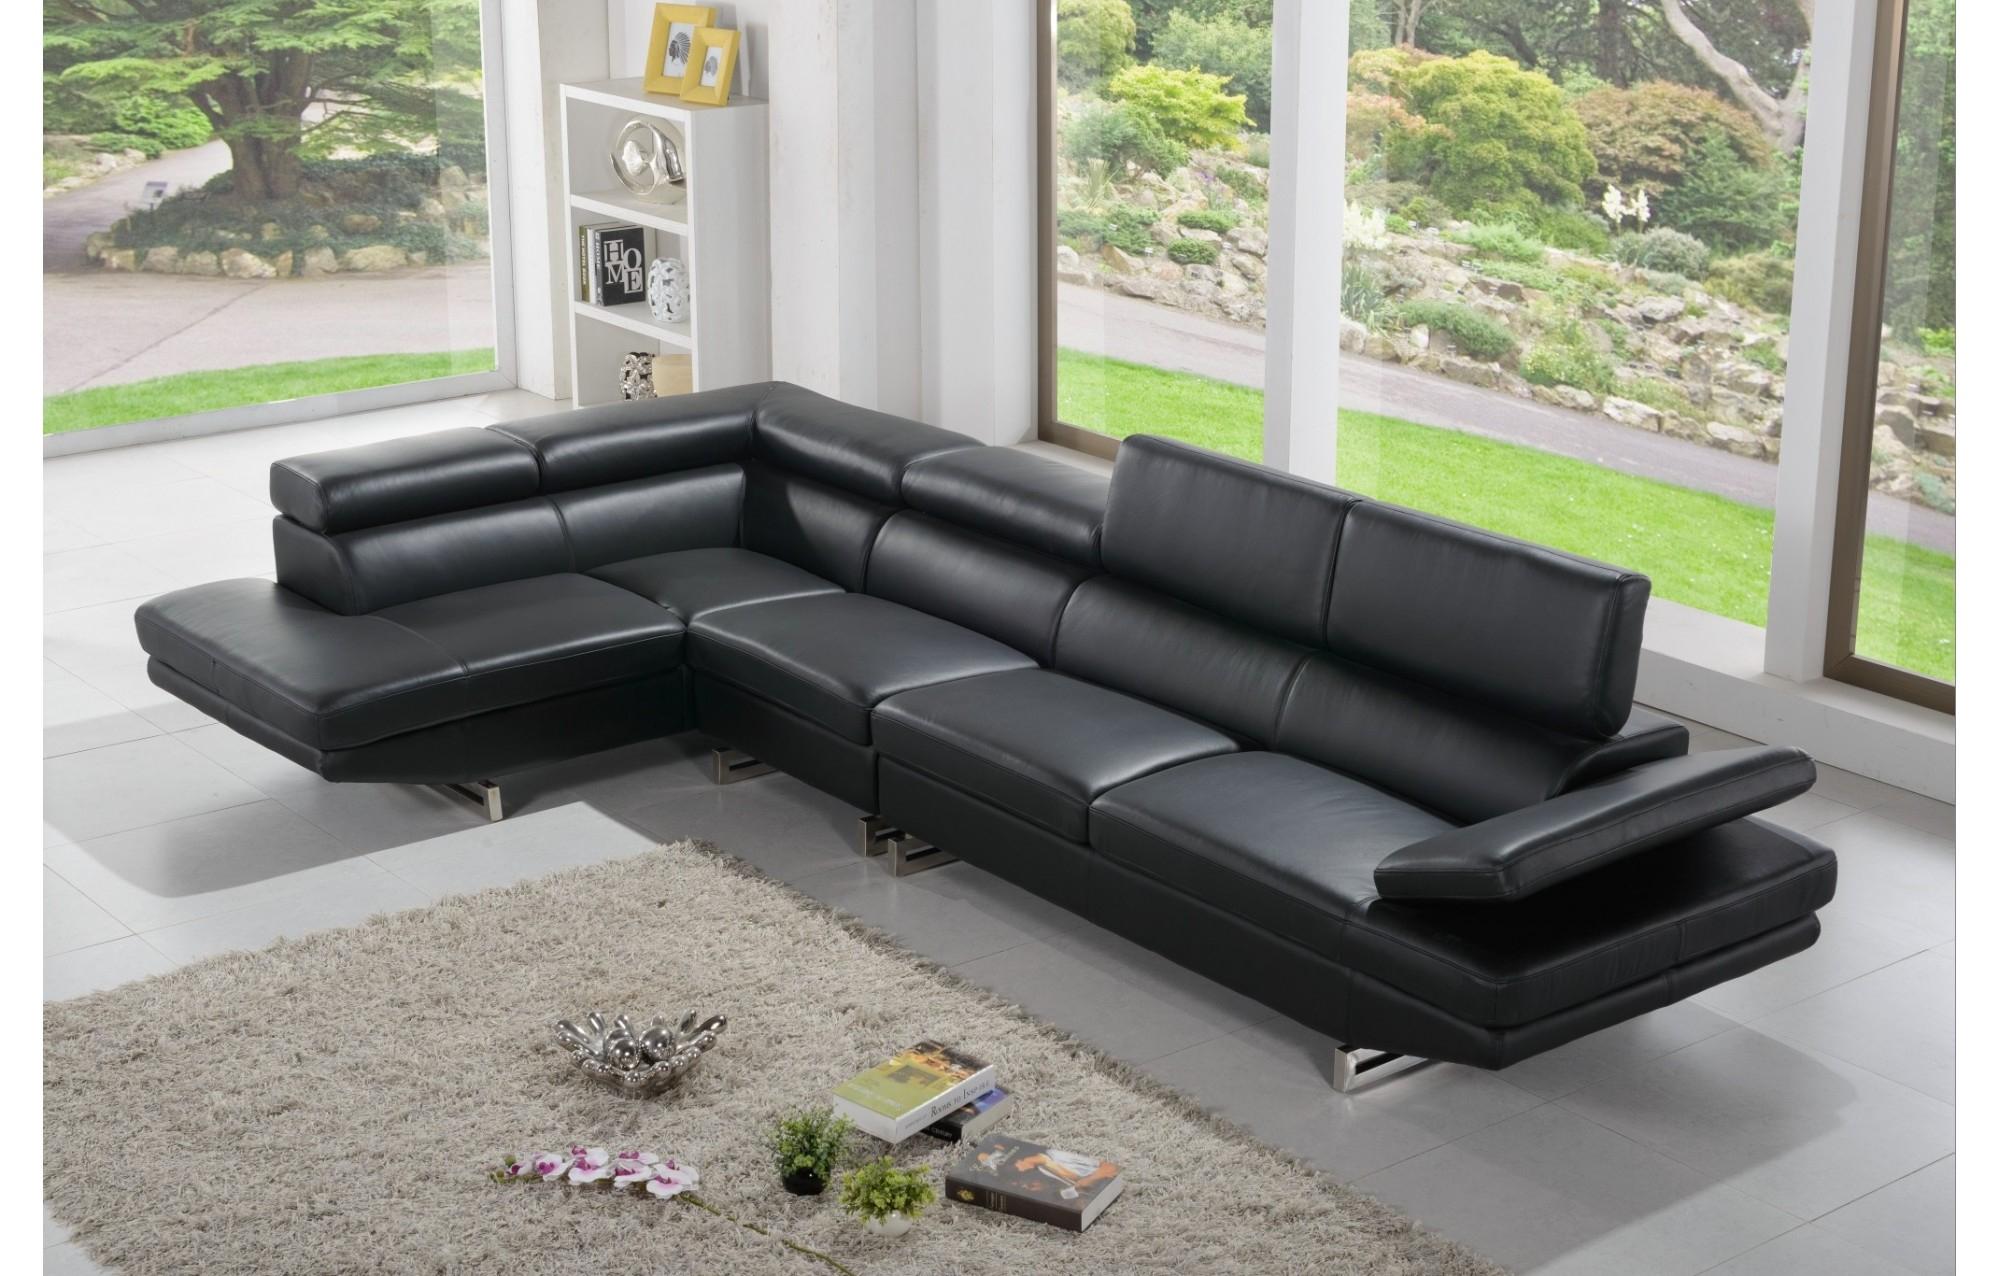 Canape Cuir Contemporain Concept - Idees Conception Jardin